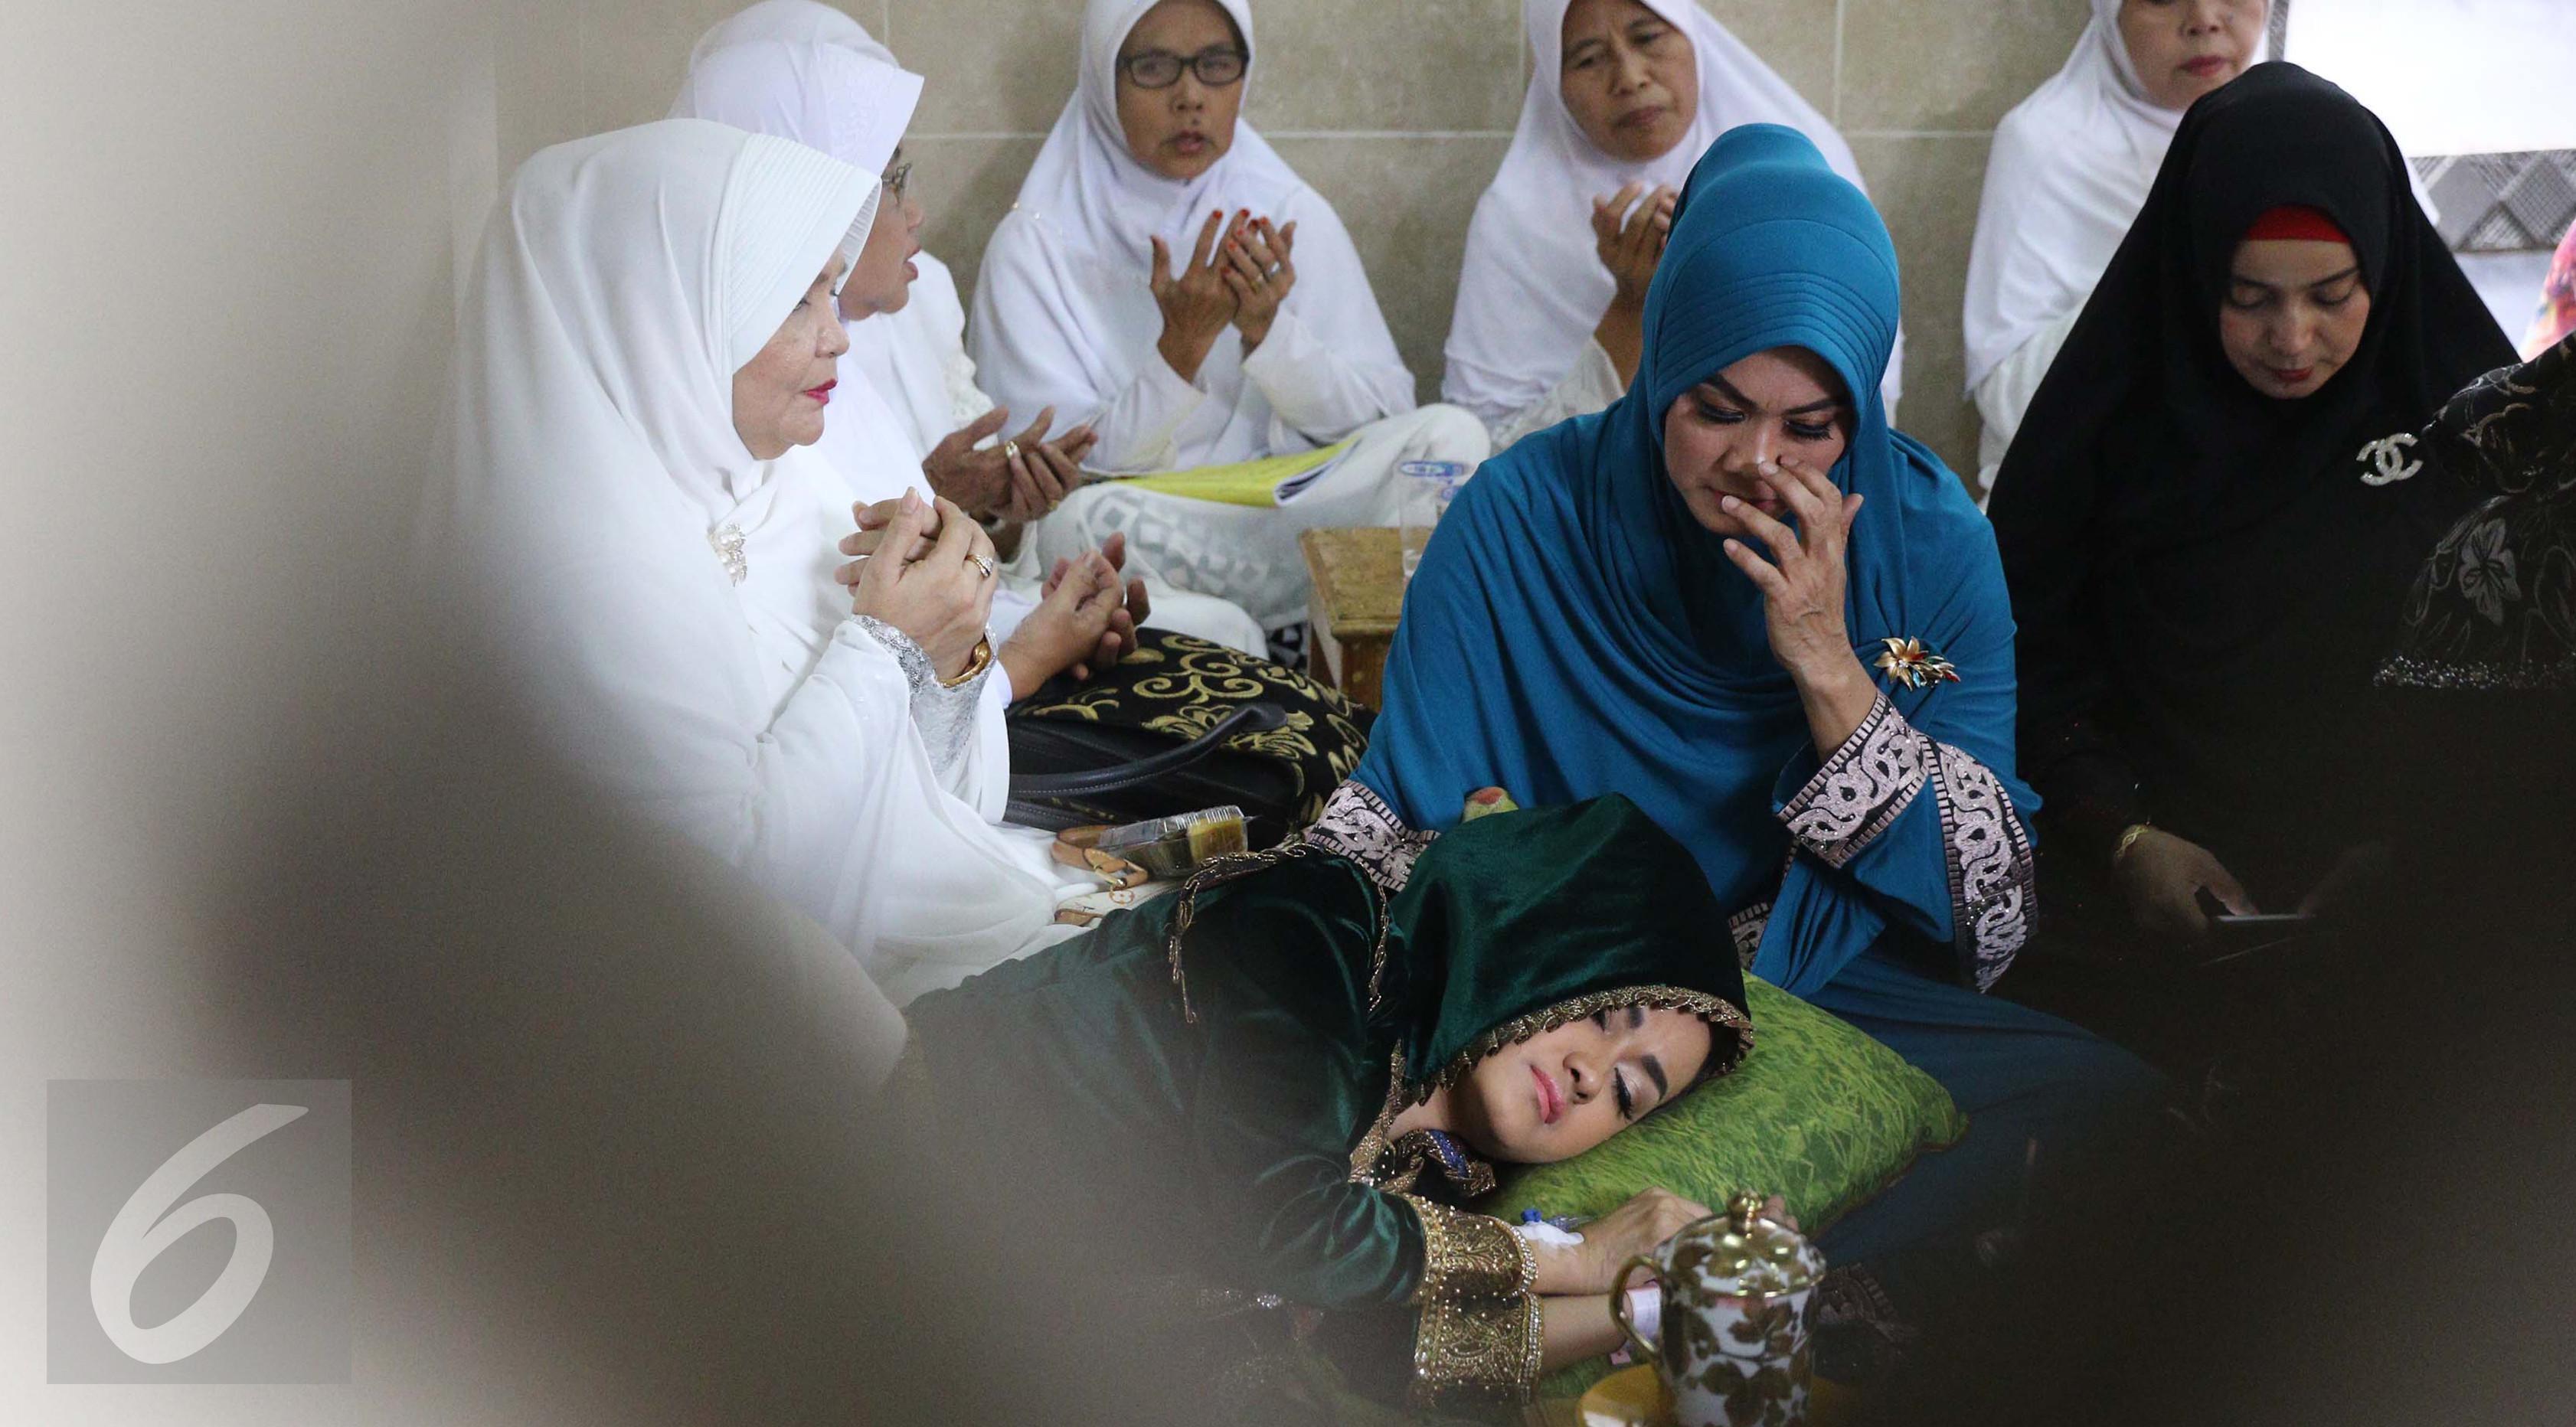 Julia Perez tidur di pangkuang sang ibu, Sri Wulansih. (Herman Zakharia/Liputan6.com)